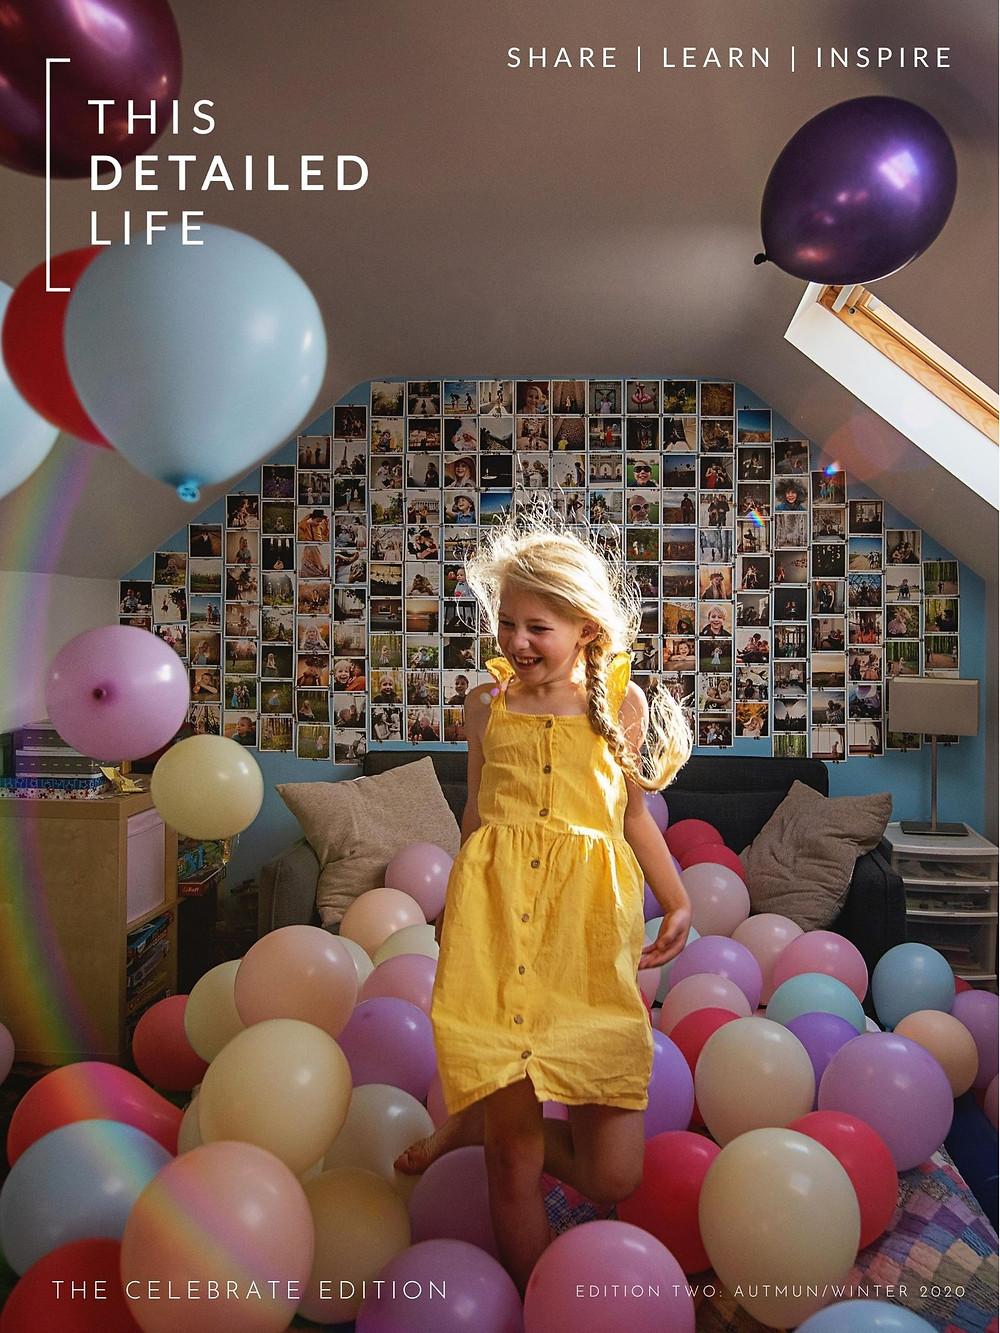 Girl in yellow dress dancing in balloons